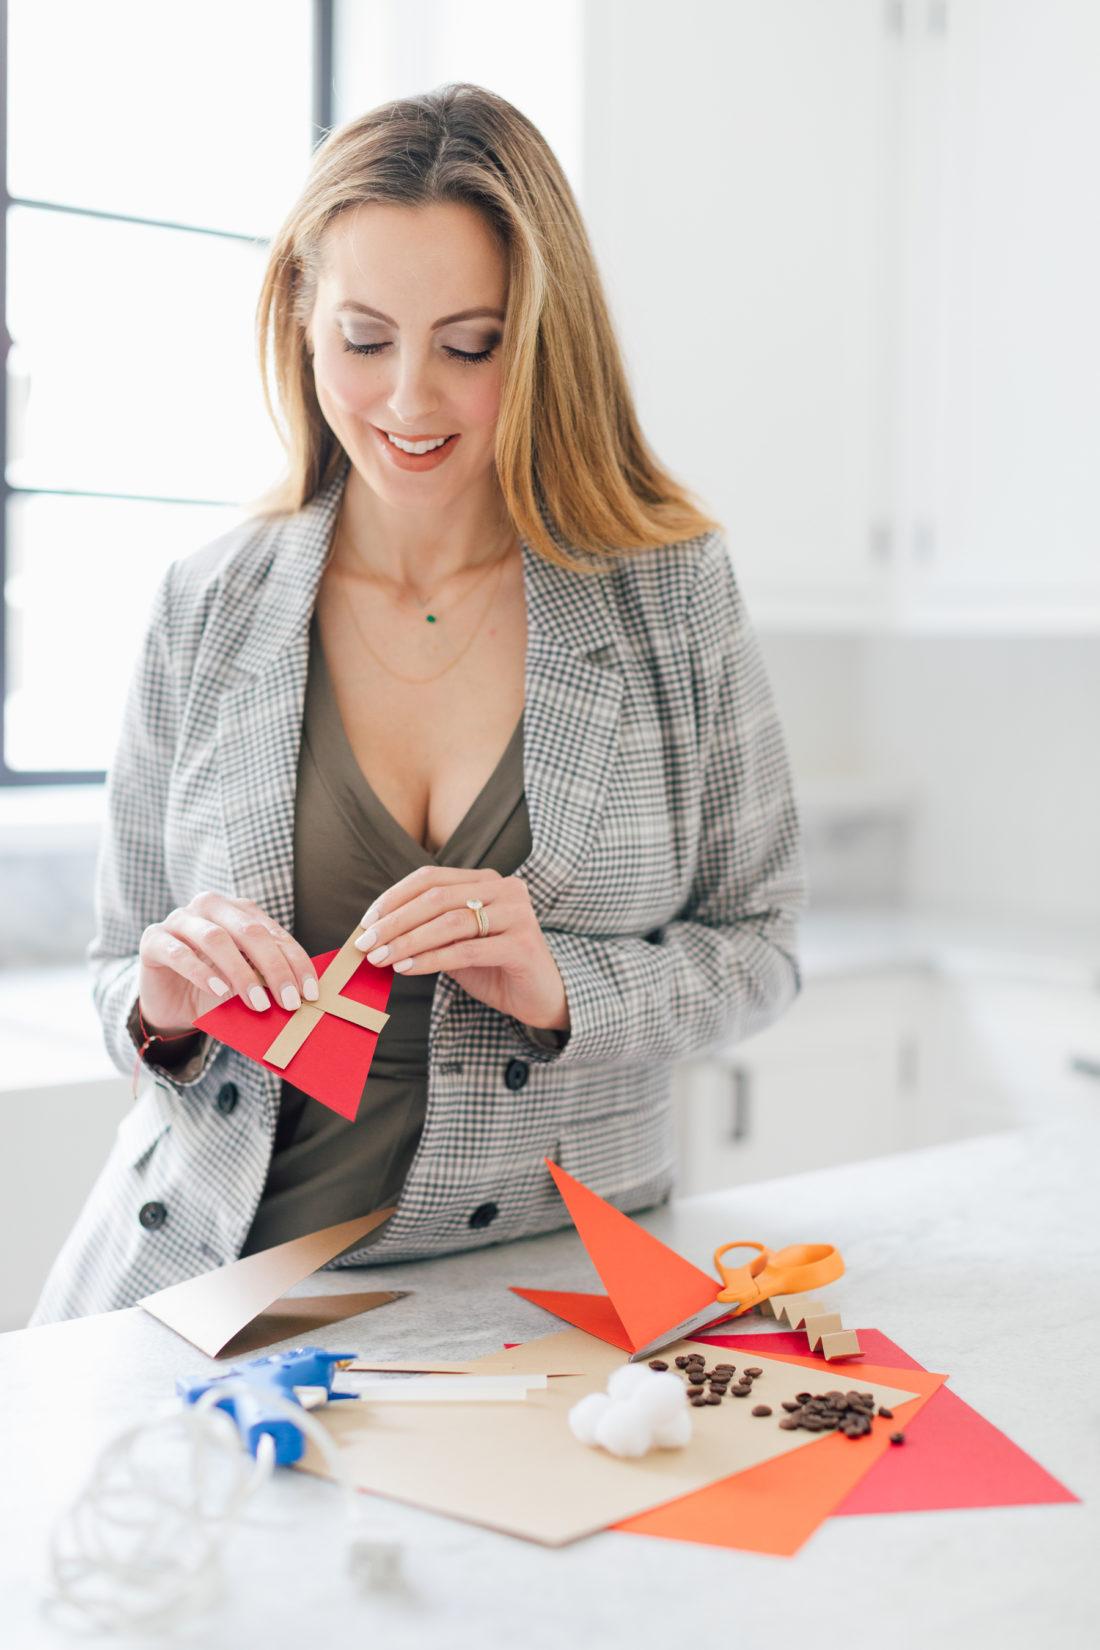 Eva Amurri Martino makes a decorative pie garland out of paper and twine